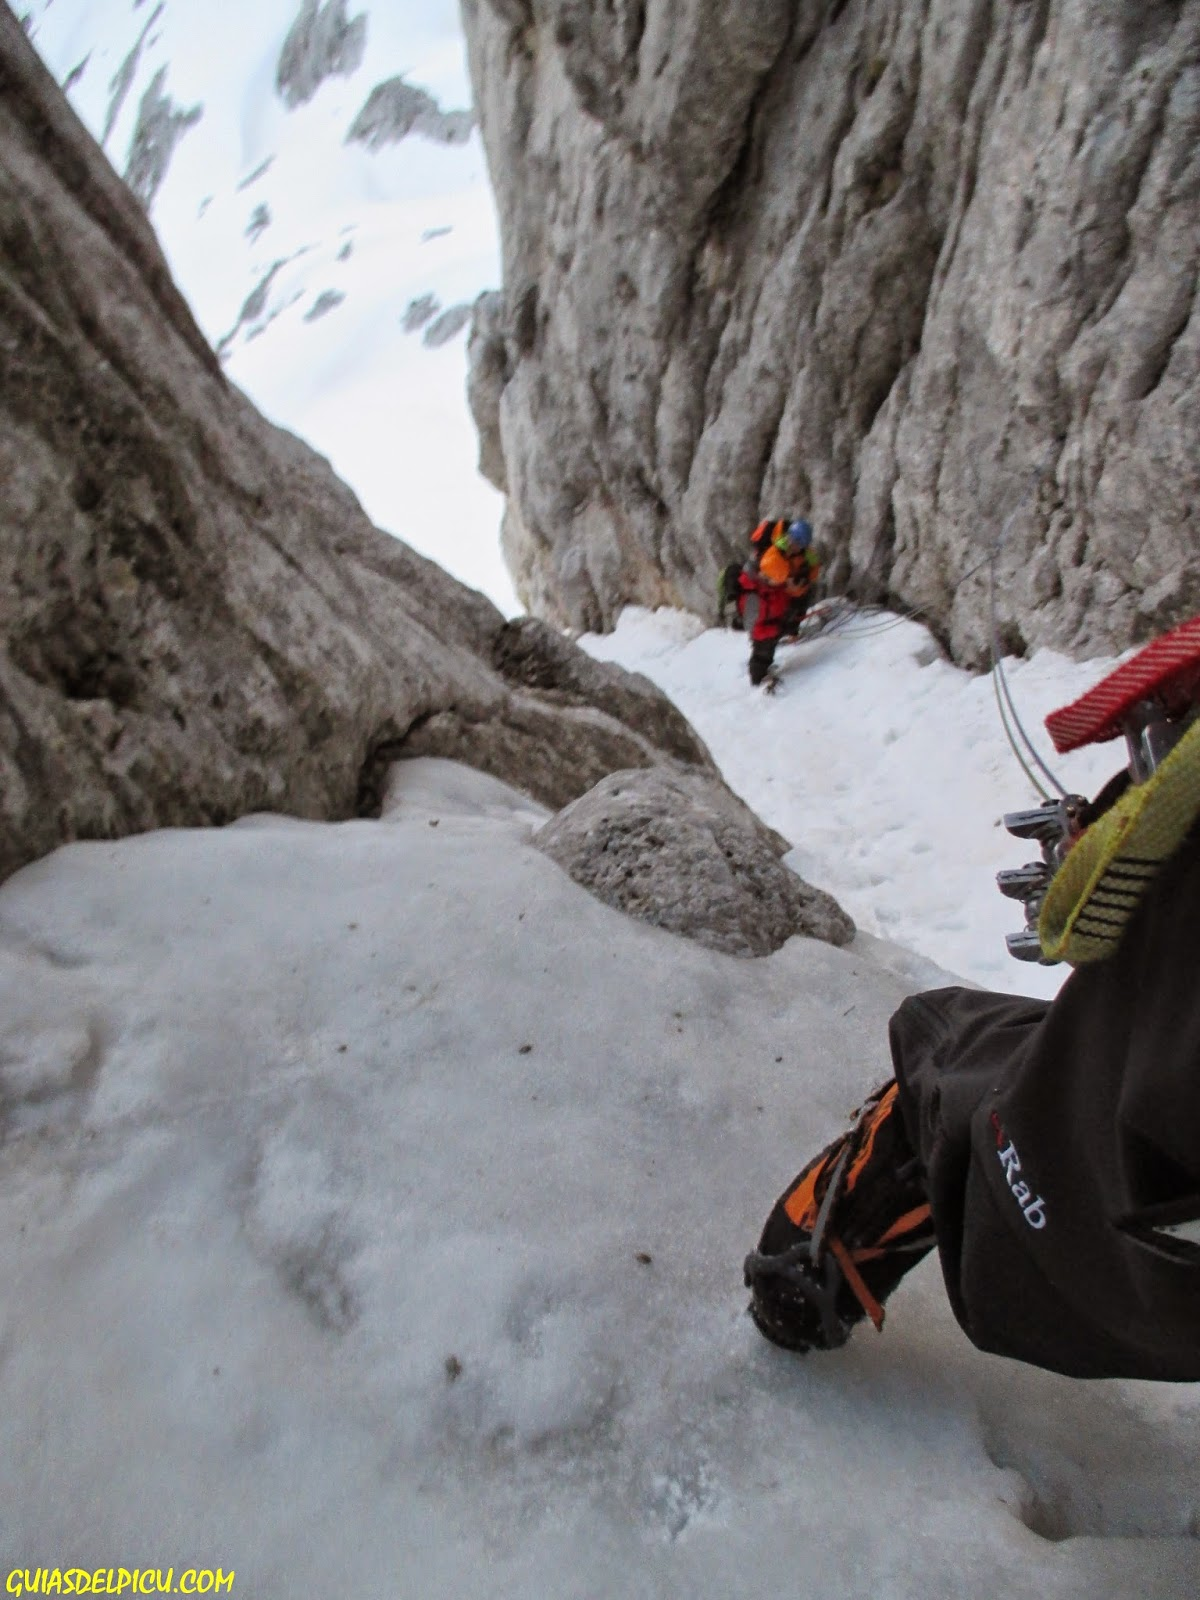 Rab calibre pant,Guias de montaña guiasdelpicu, especialista en los Picos de Europa , escalar corredores con guia